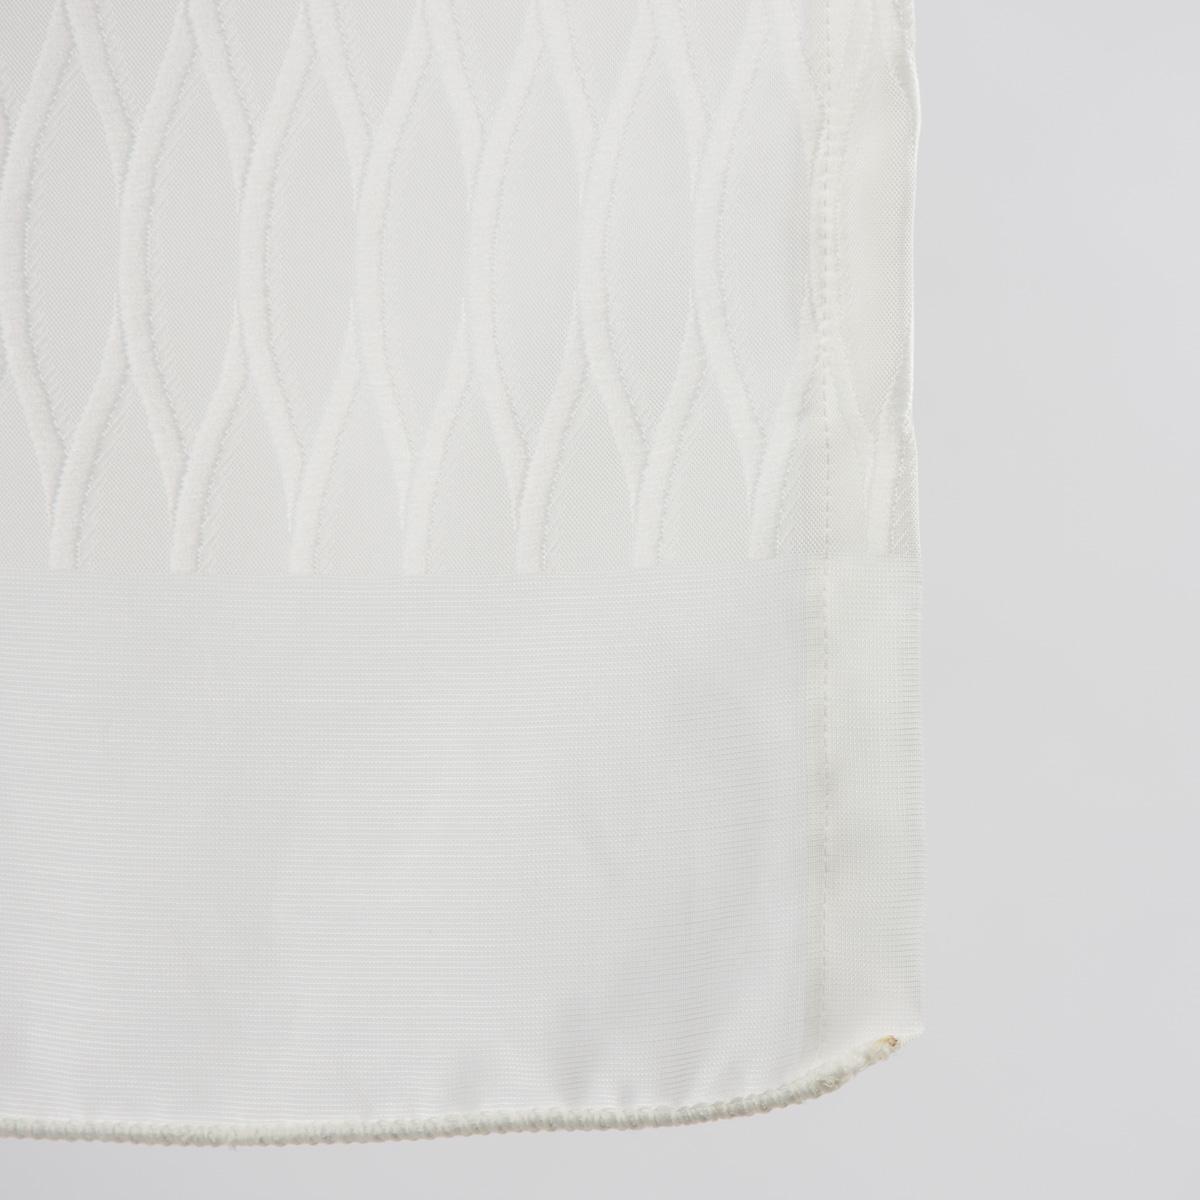 senschal fertigvorhang vorhang oxana wei 137x245cm inspirationen stilwelten skandinavischer stil. Black Bedroom Furniture Sets. Home Design Ideas